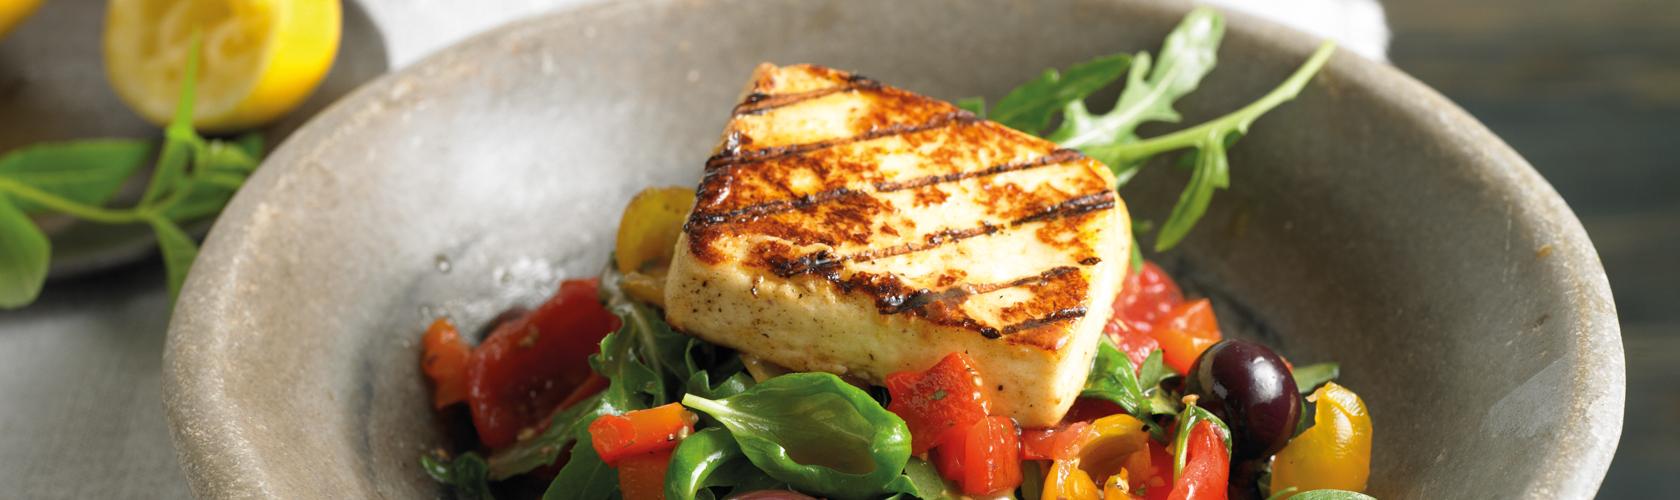 GutGlut mit Paprika-Tomate-Oliven-Salat